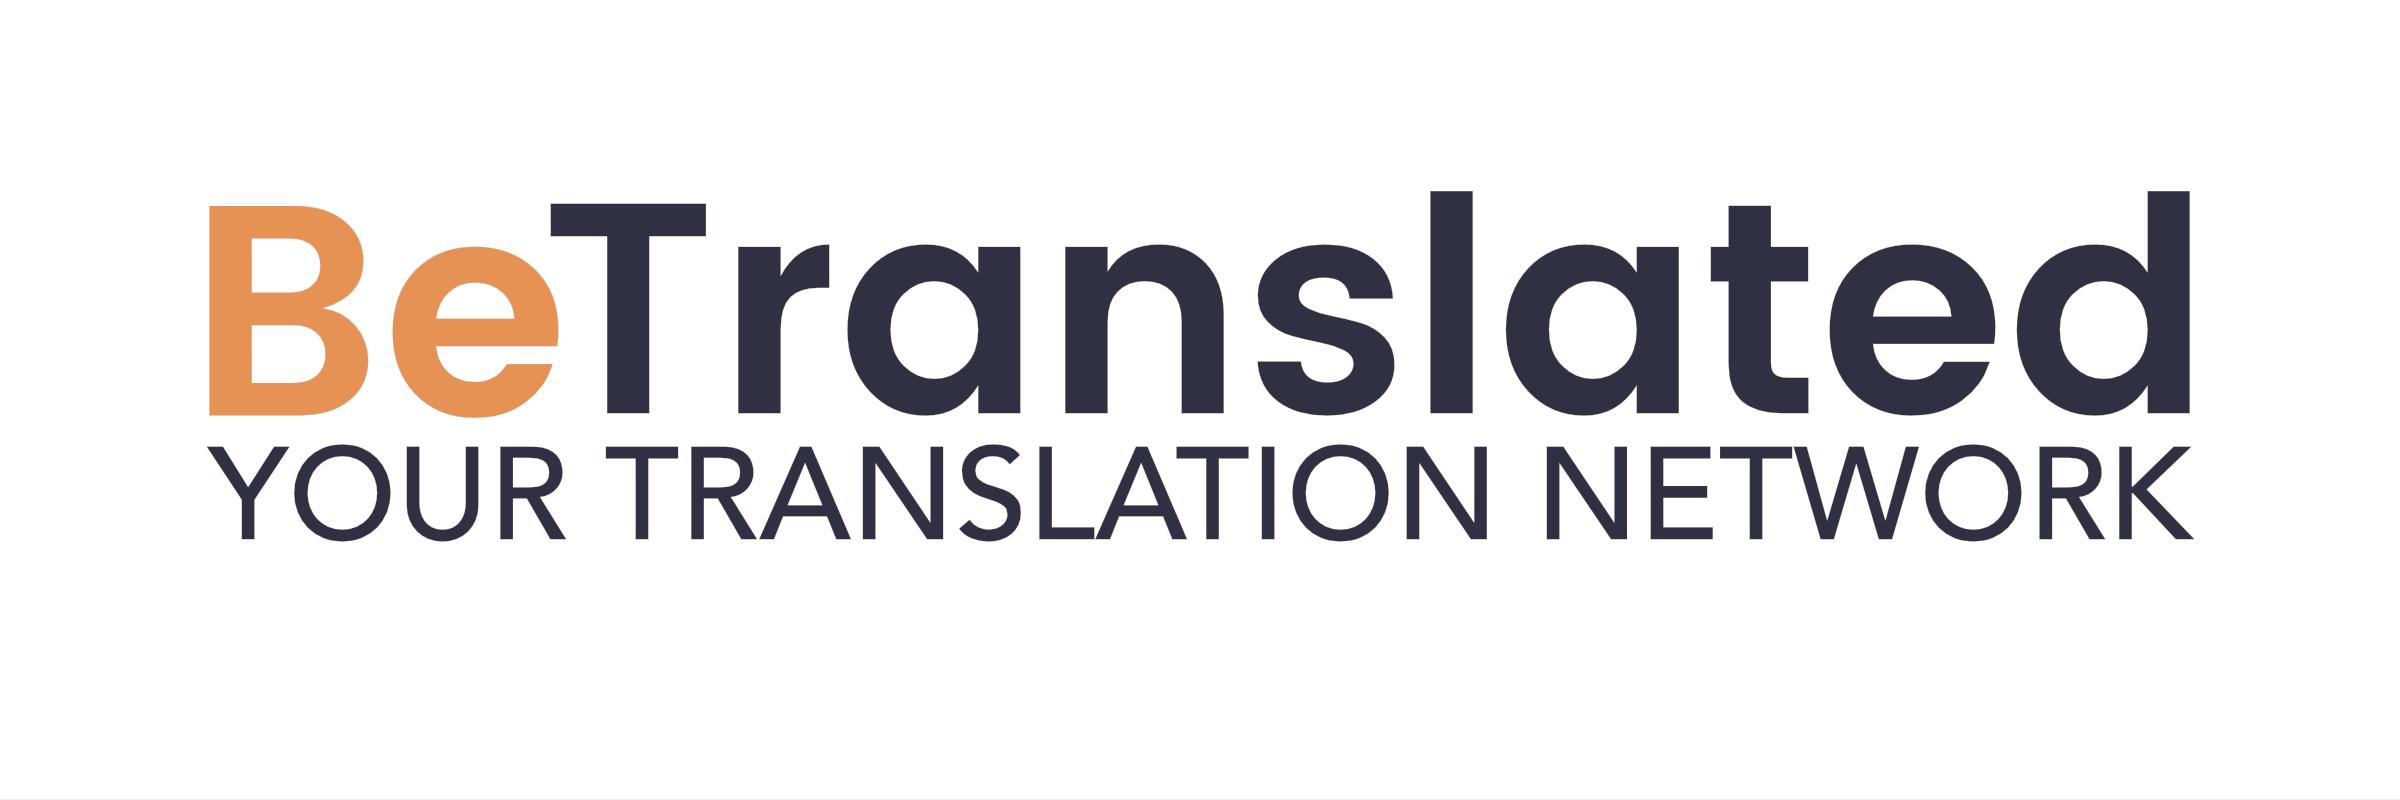 Translation Bureau: a selection of sites